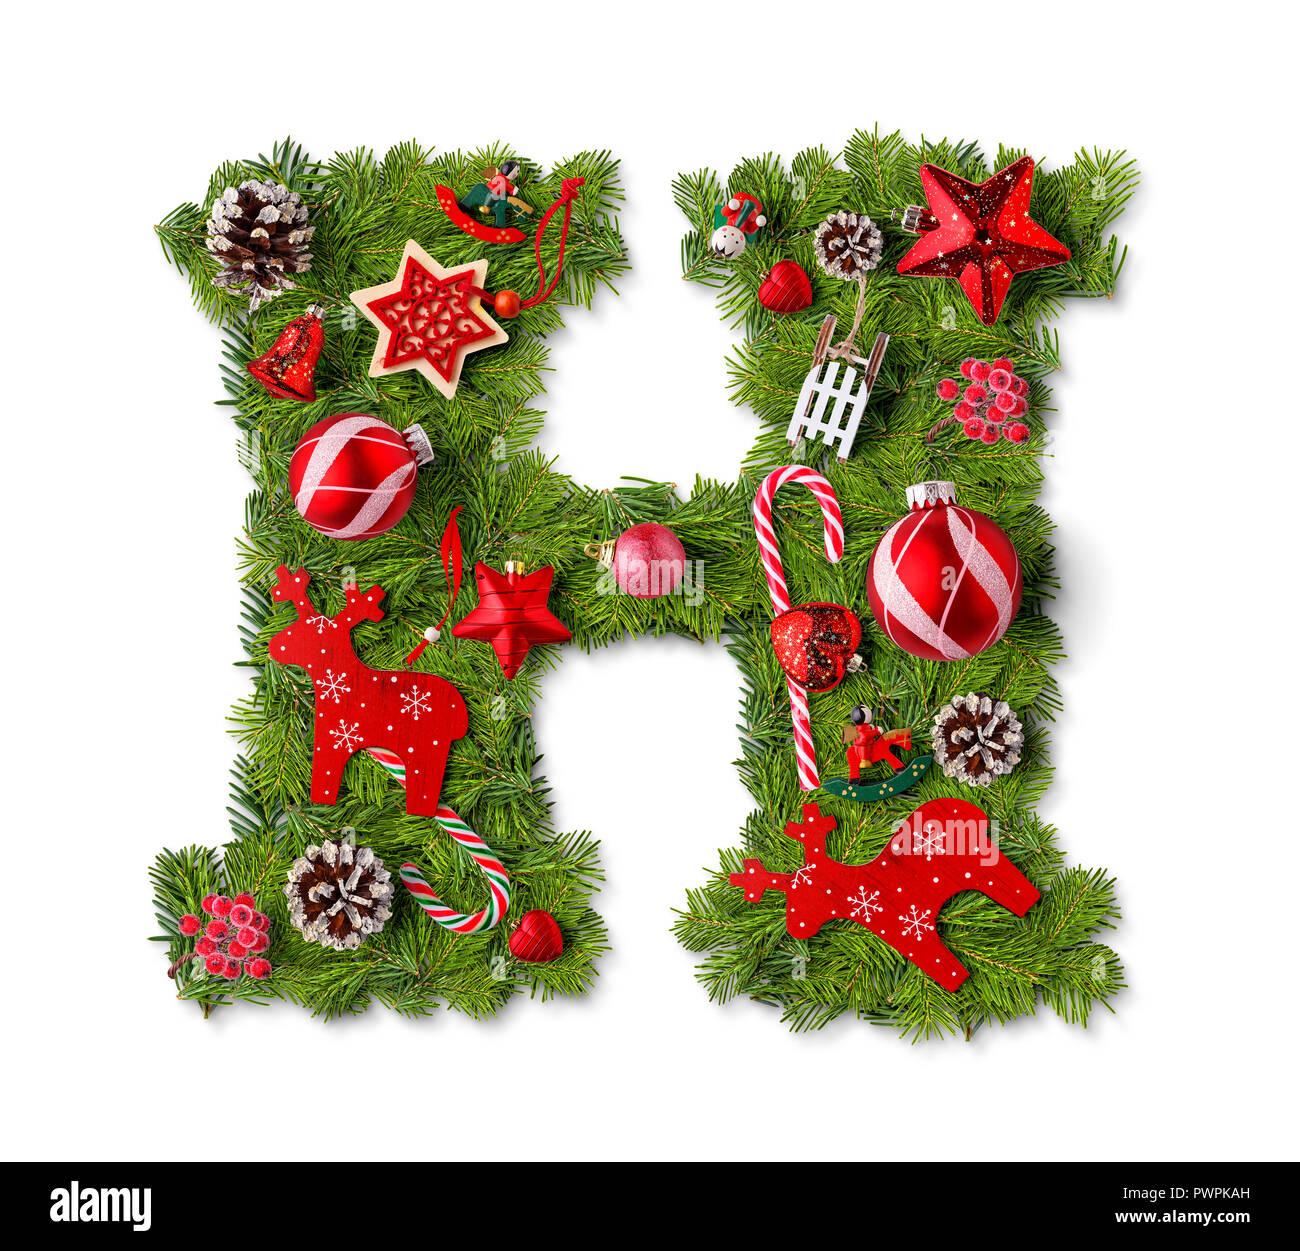 Christmas Alphabet.Christmas Alphabet Letter H Isolated On White Stock Photo